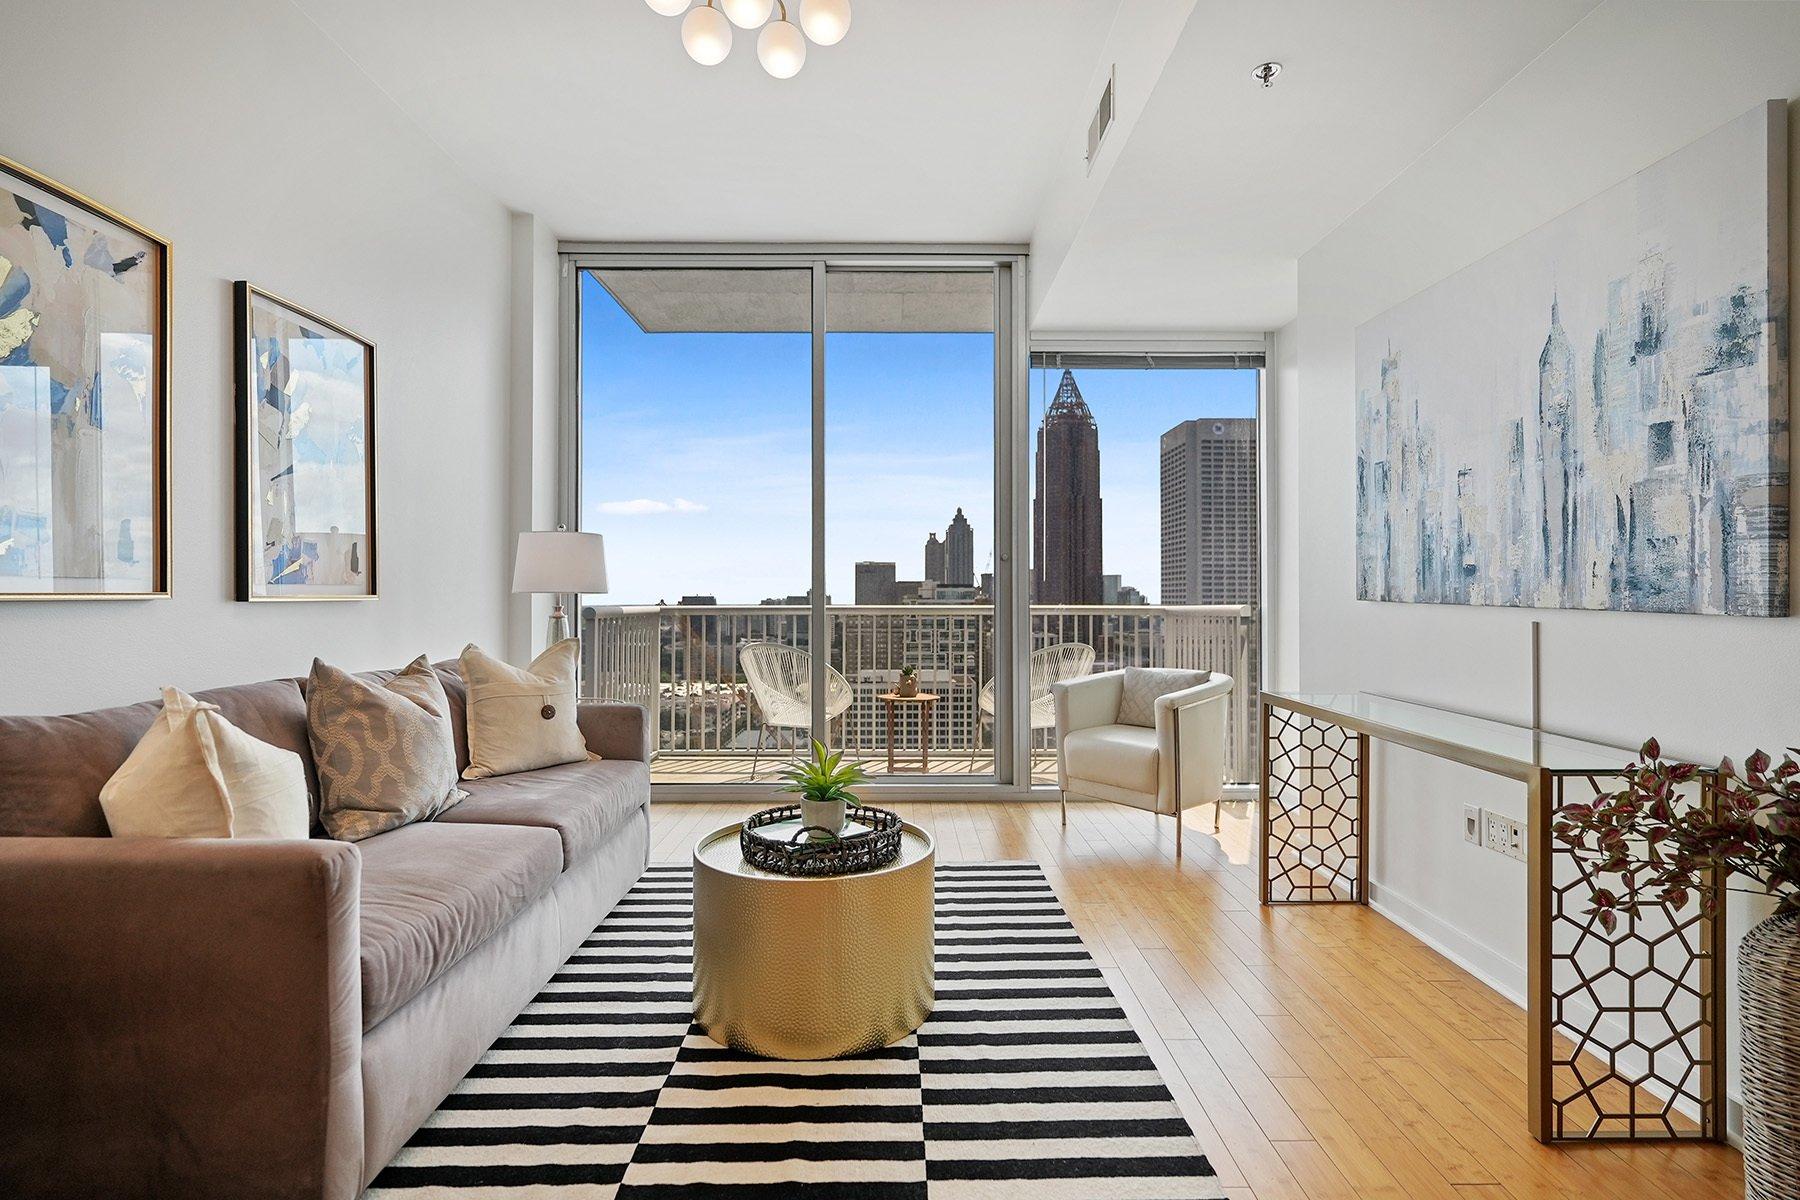 Condo in Atlanta, Georgia, United States 1 - 11613728